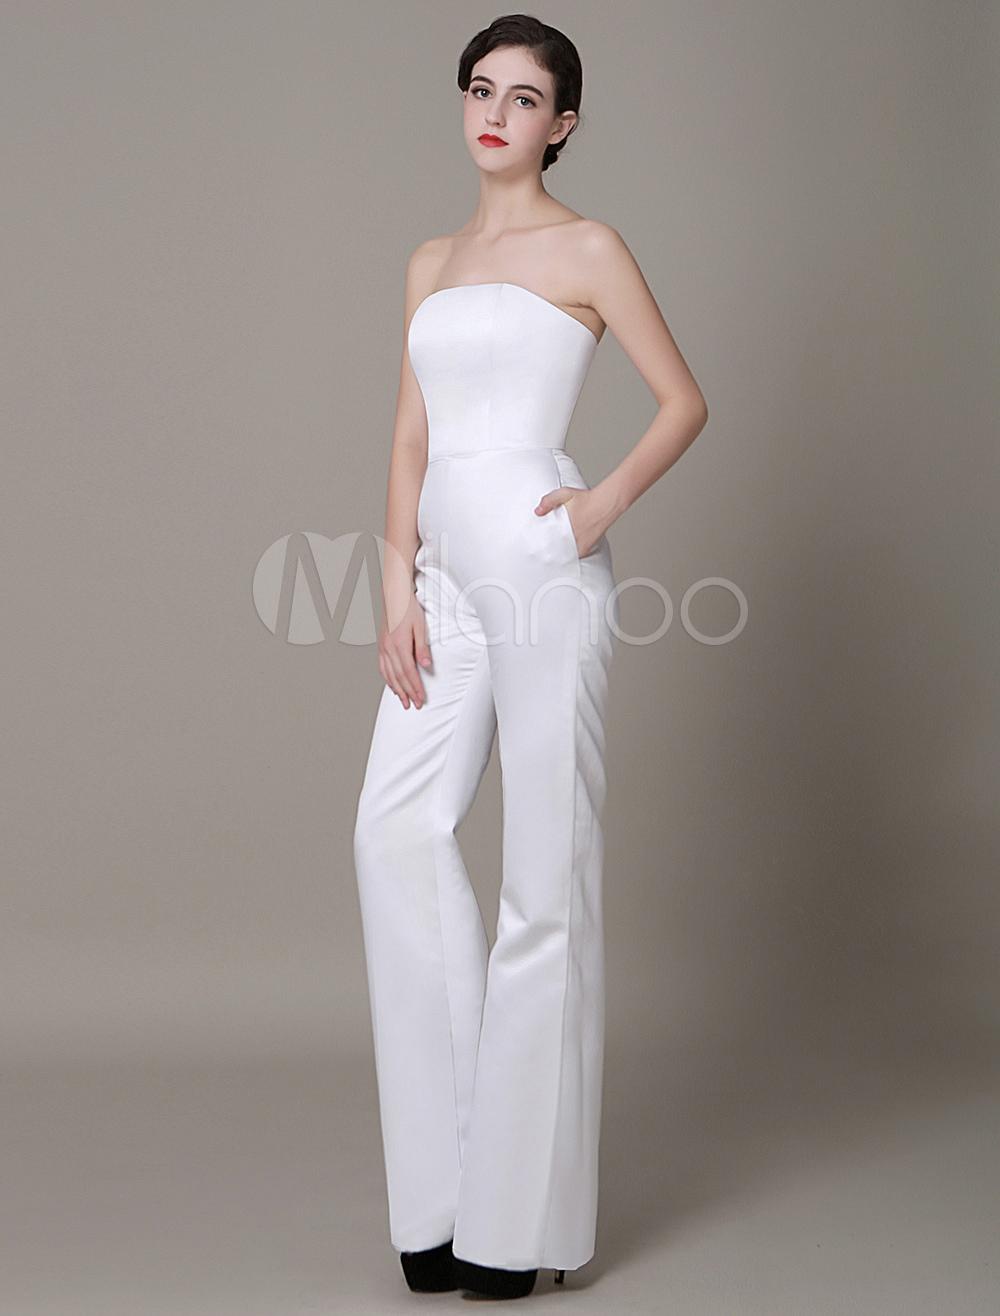 White Satin Wedding Suits Strapless High Waist Red Carpet Dress Milanoo (Cheap Wedding Dress) photo